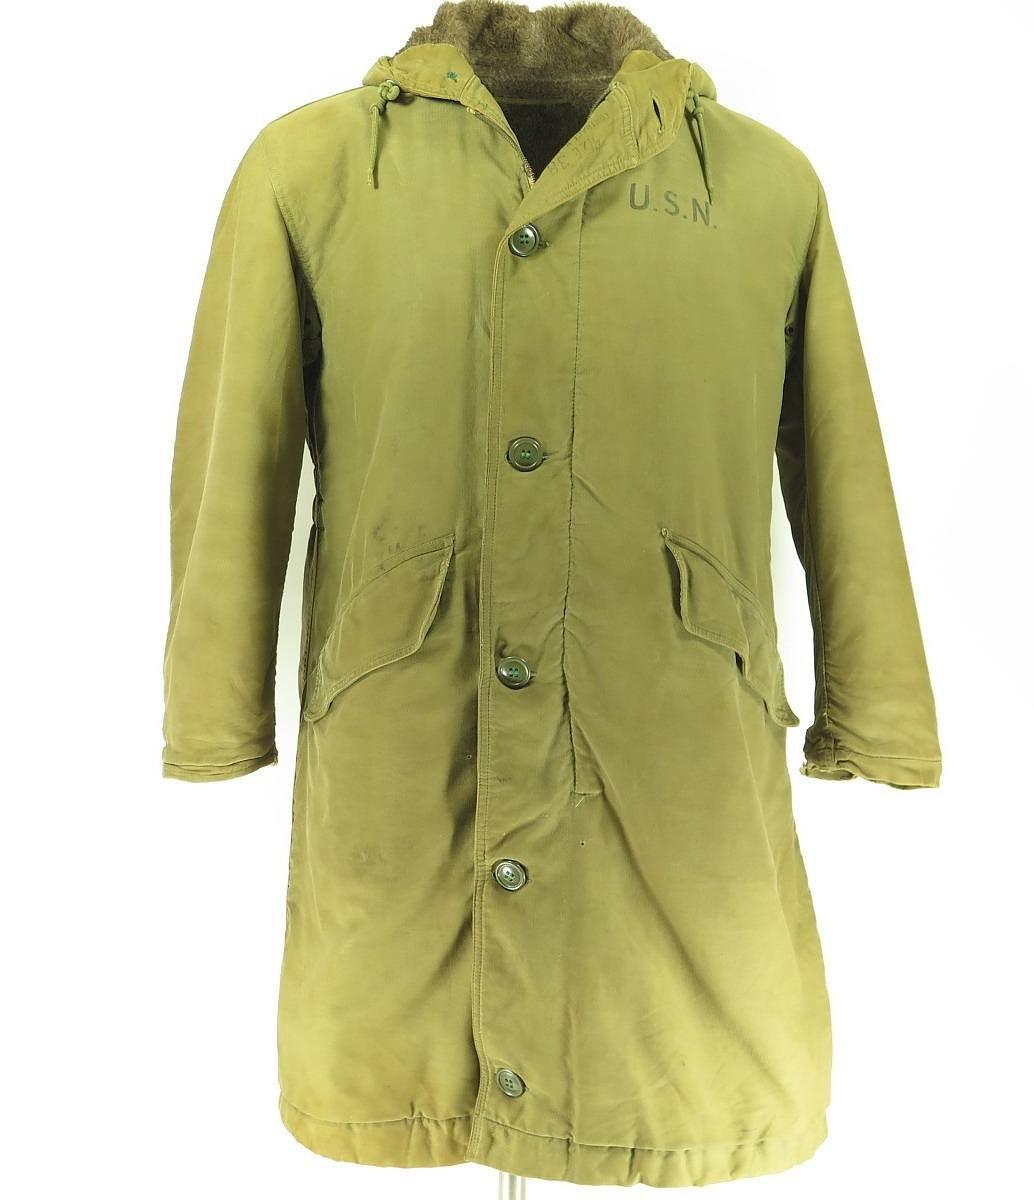 Vintage 40s Wwii Usn Navy Military Deck Jacket Coat 38 Nxsx